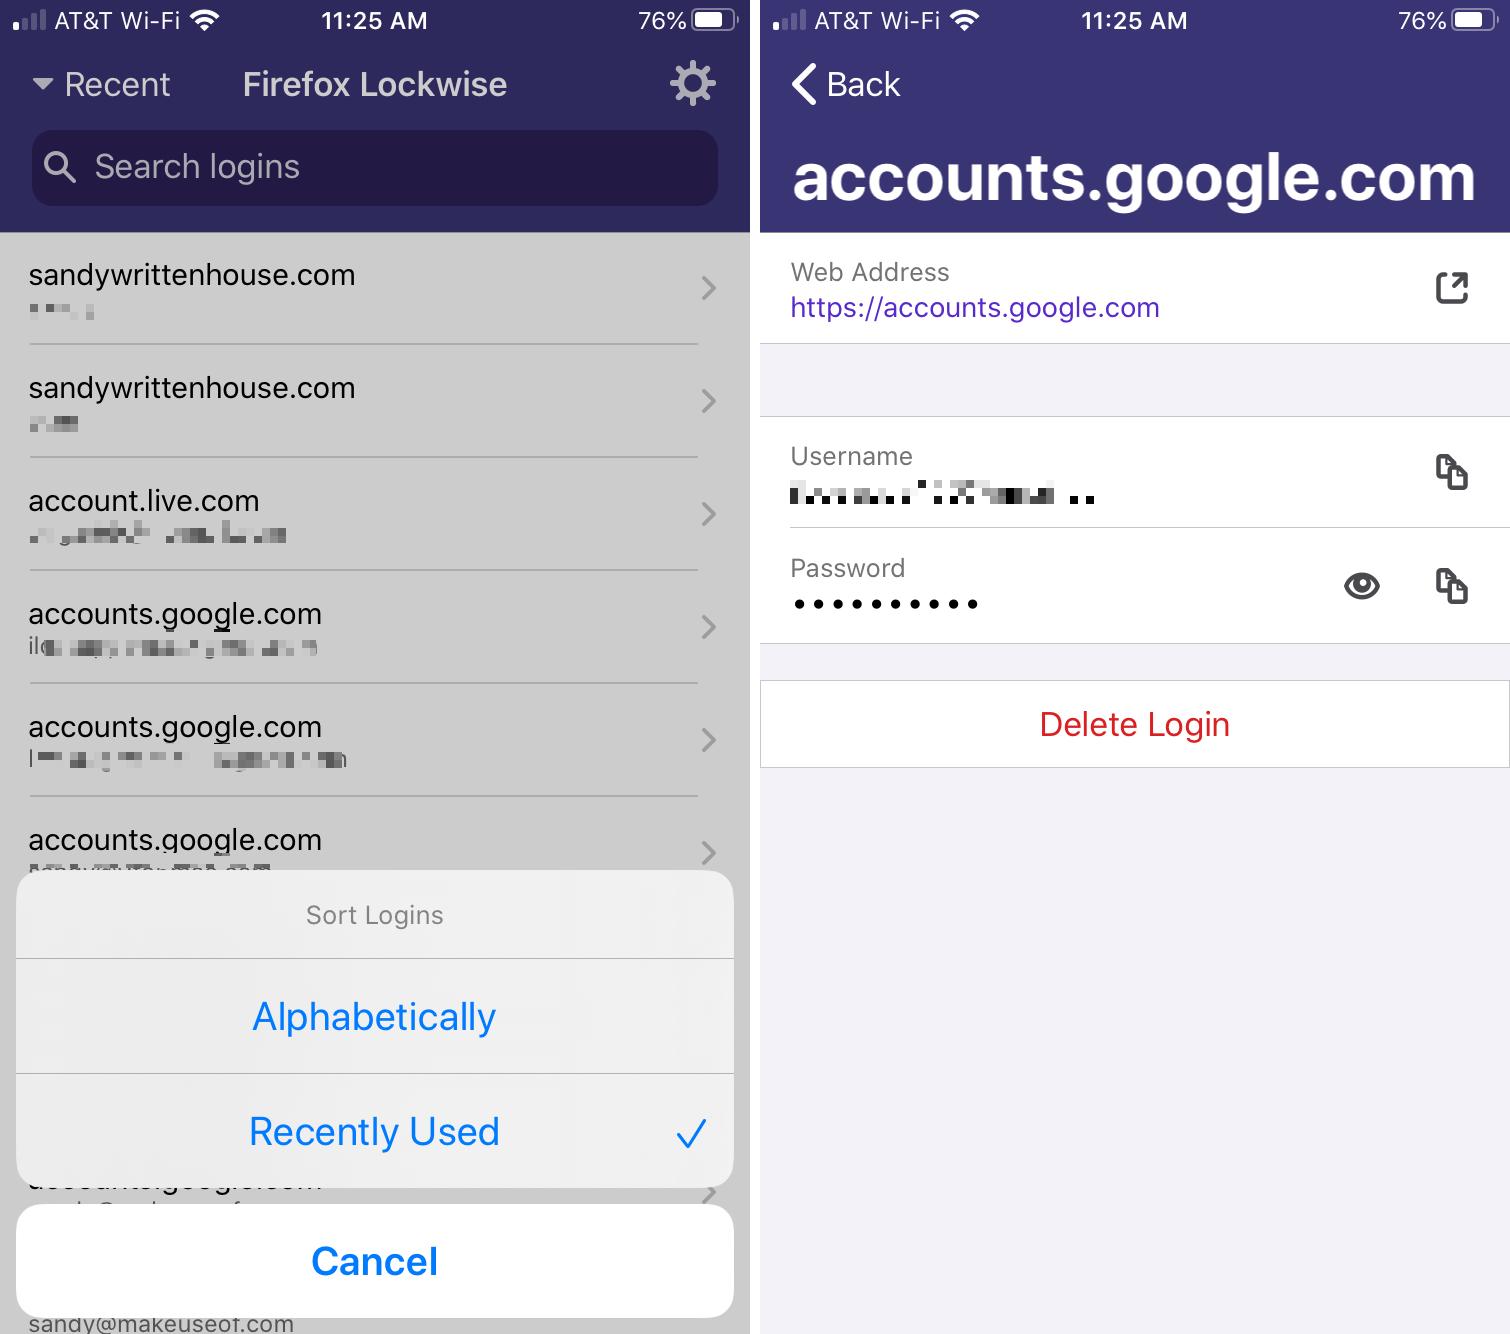 Firefox Lockwise Accounts iPhone